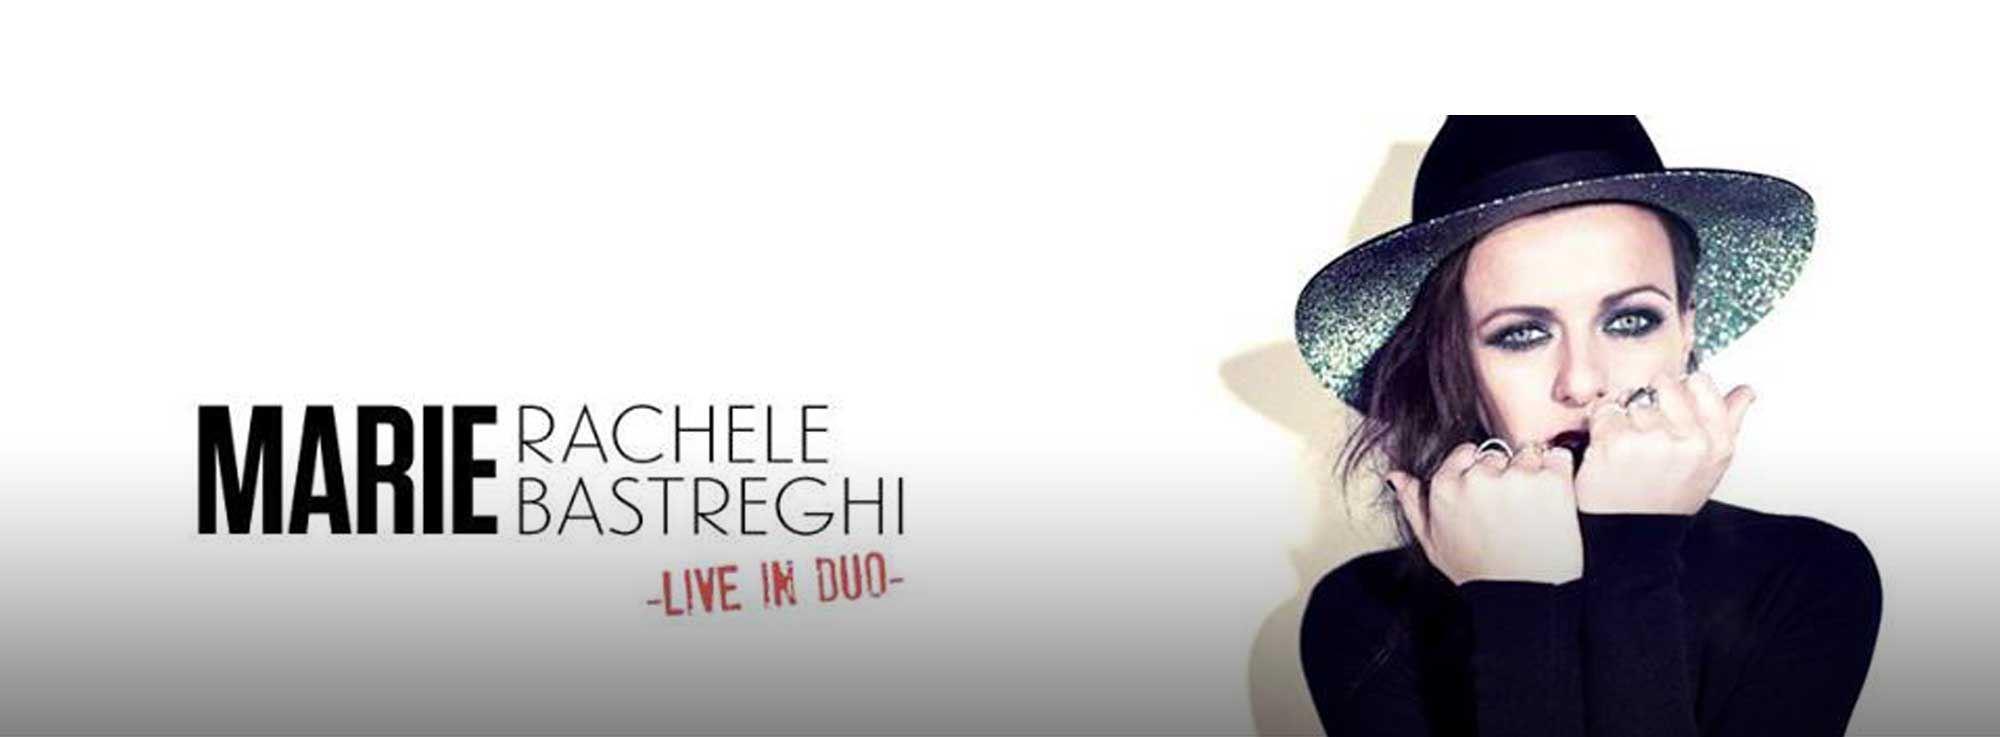 Bari: Rachele Bastreghi in concerto